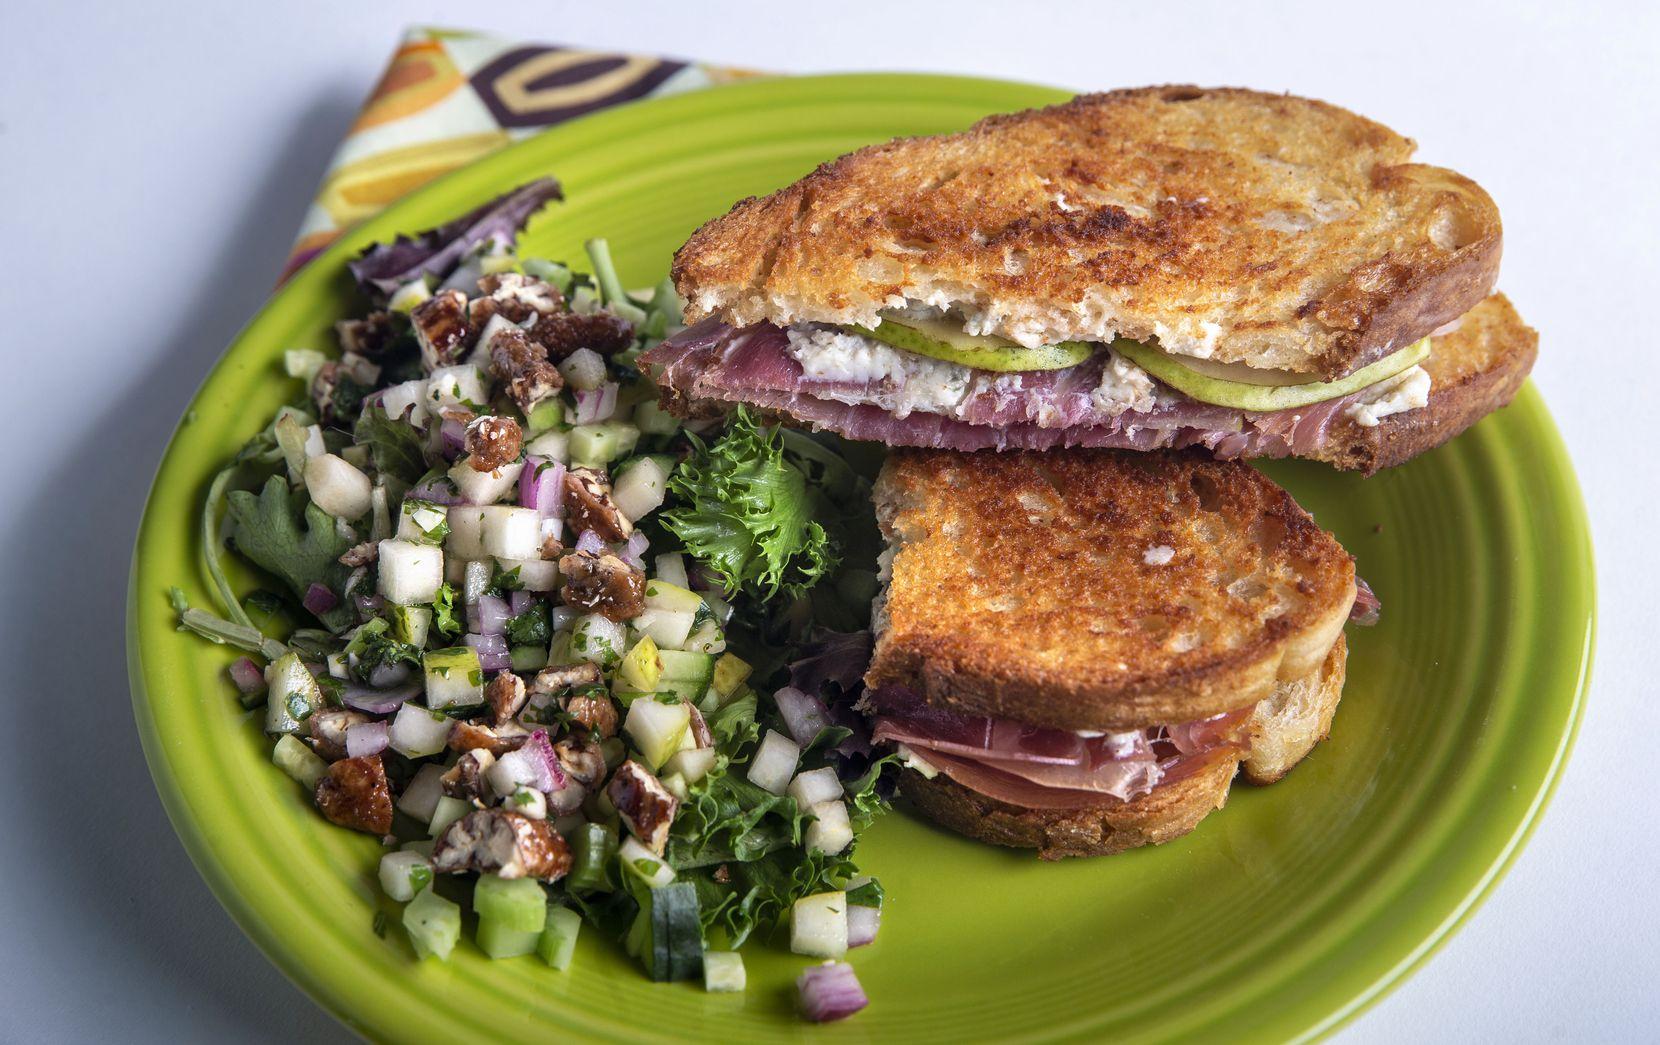 A grilled prosciutto, pear and gorgonzola sandwich